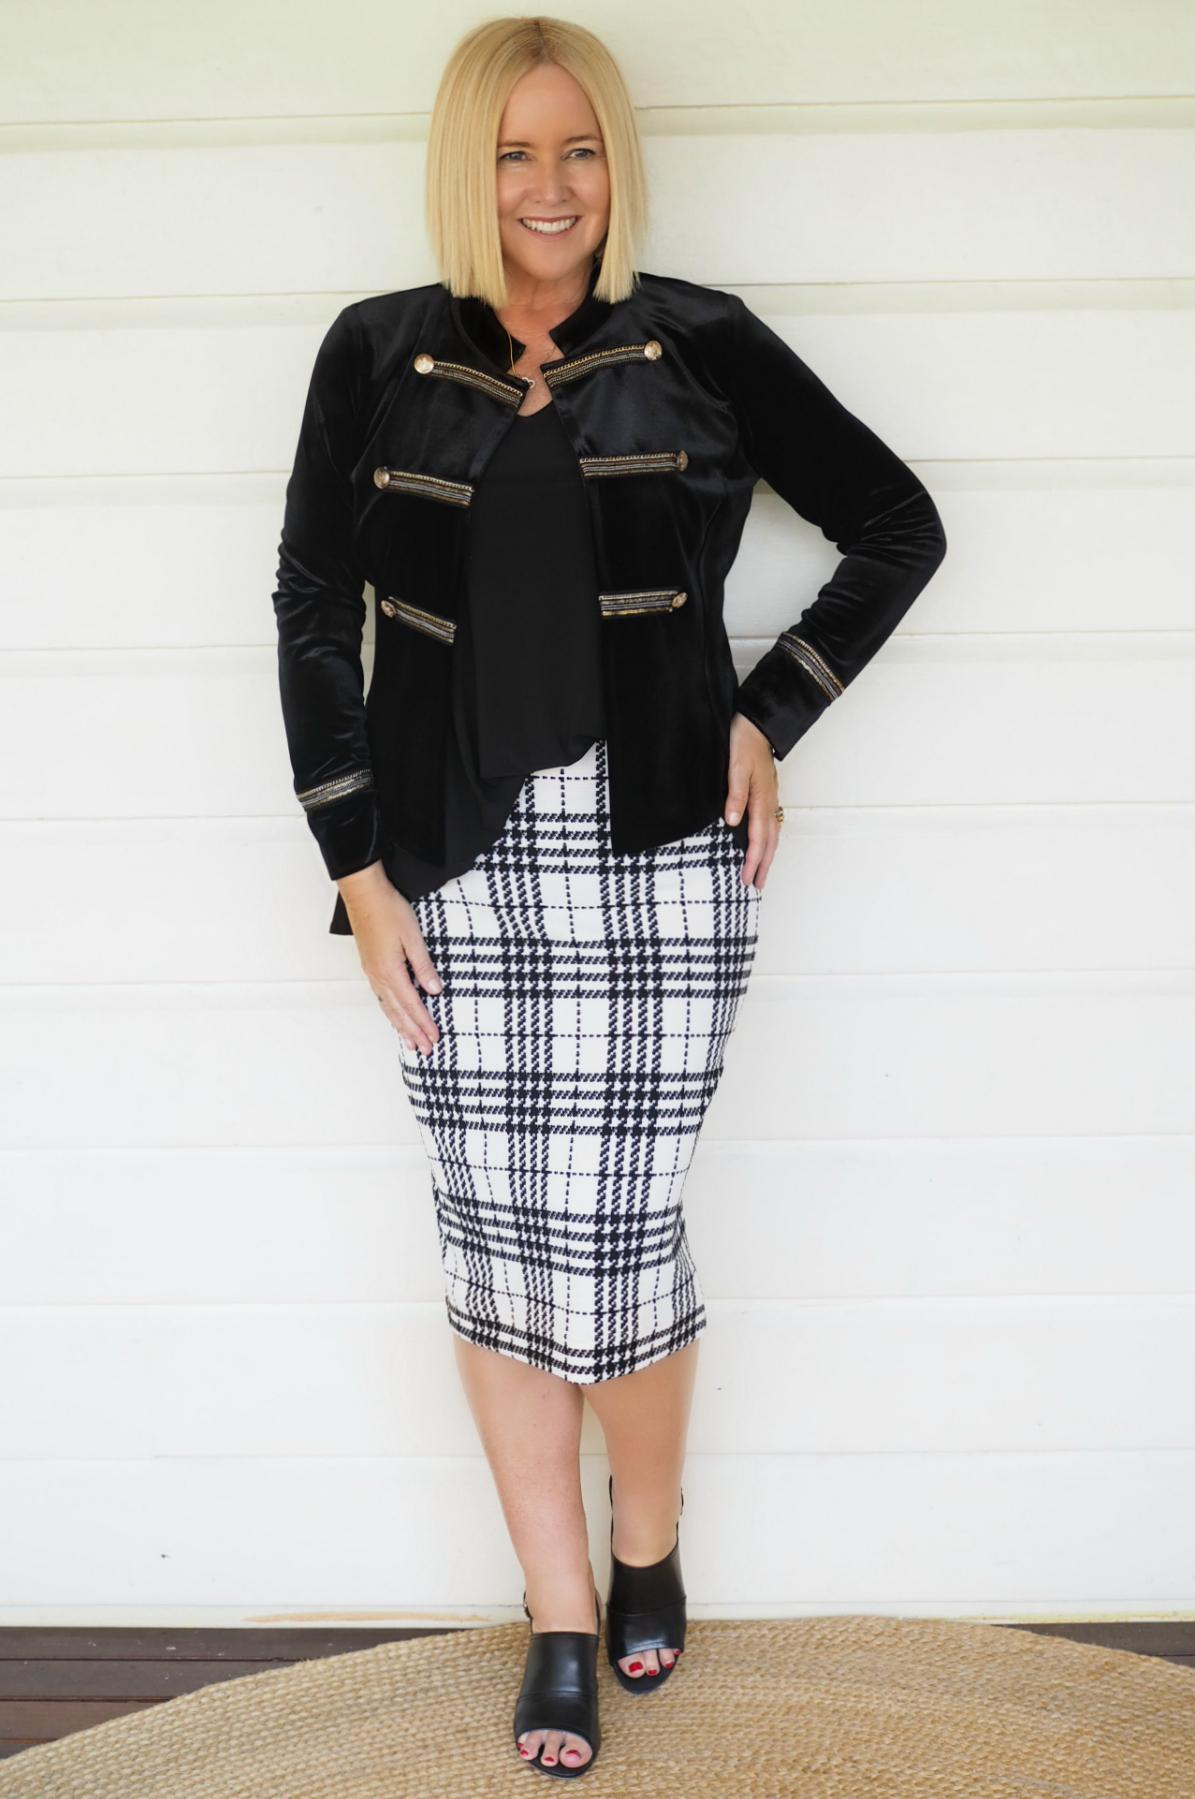 Motto jacket, top and skirt | FRANKiE4 Footwear mules